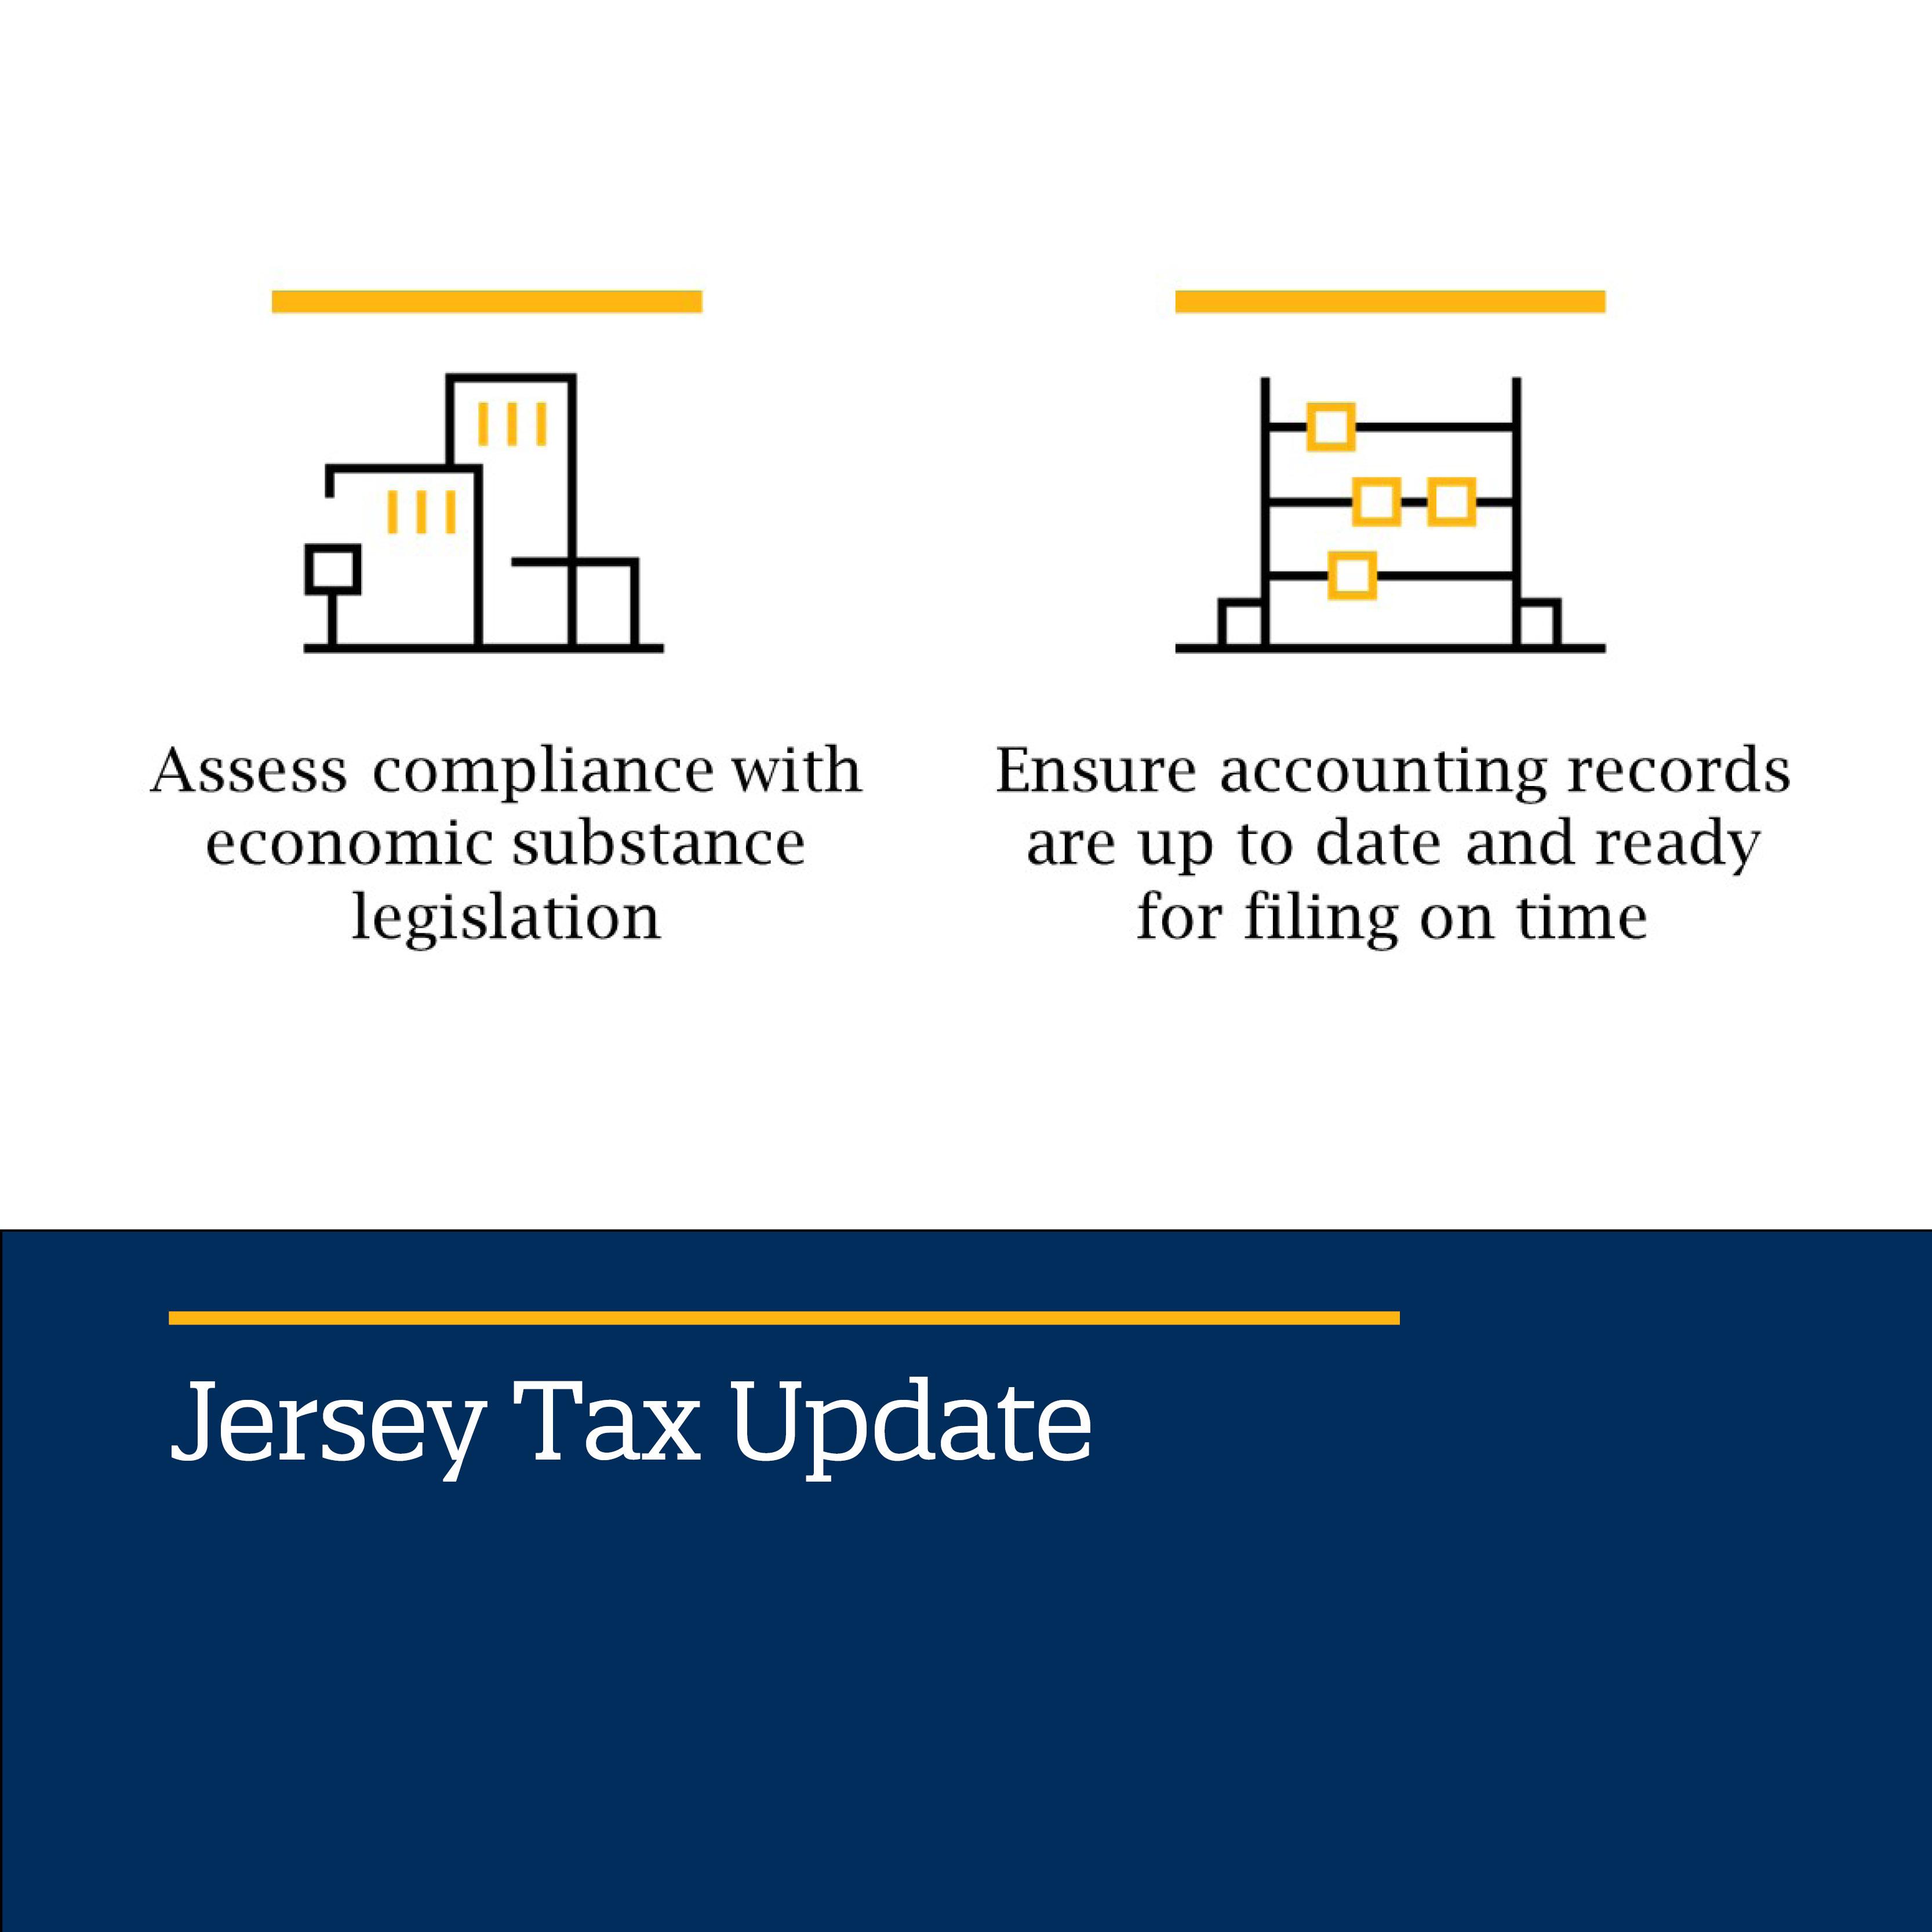 Jersey Tax Update